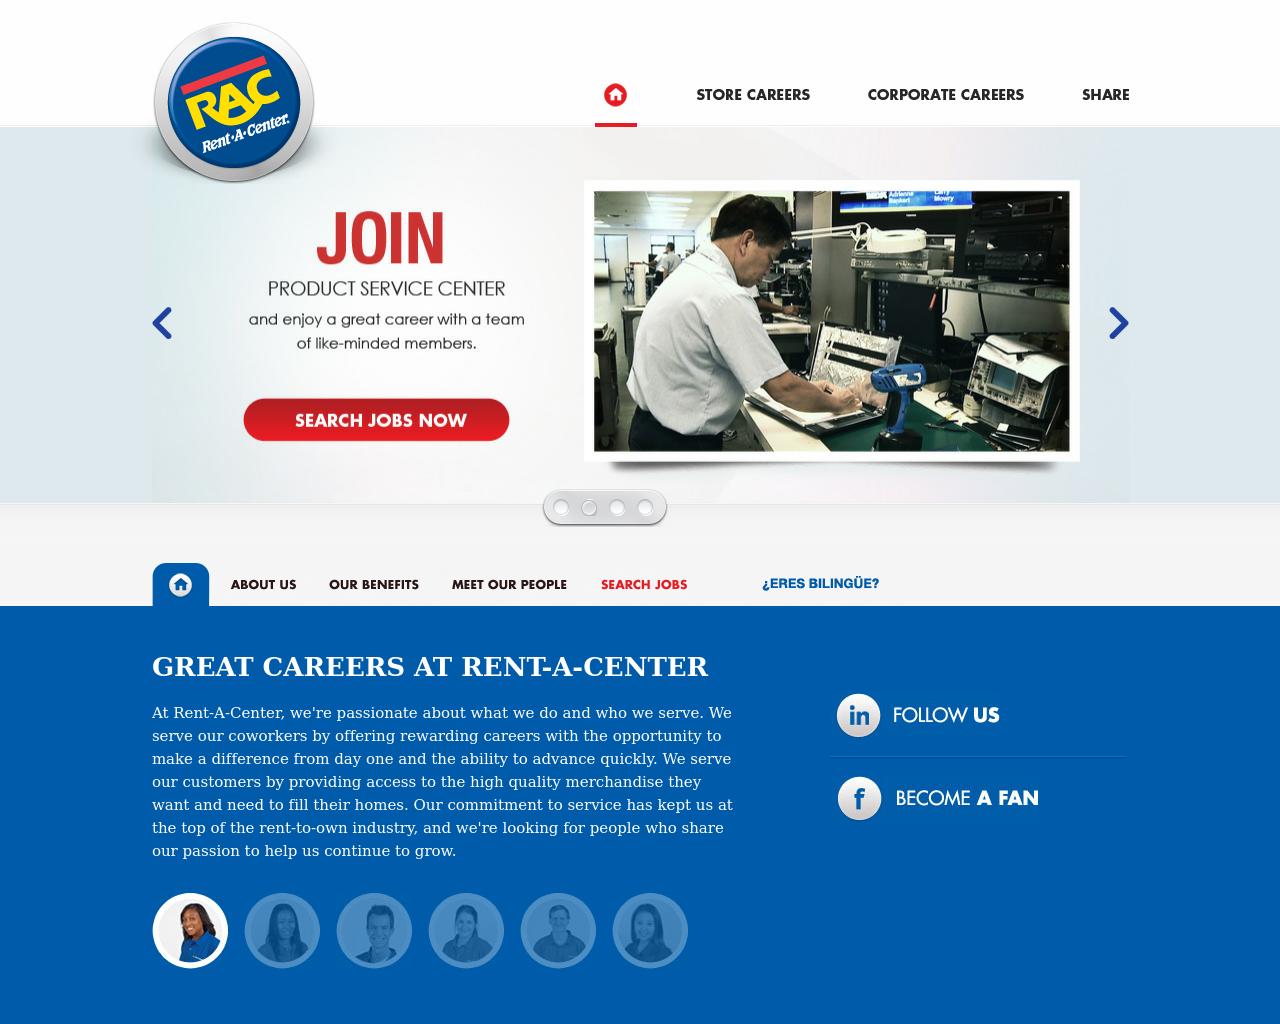 RAC-Careers-Advertising-Reviews-Pricing